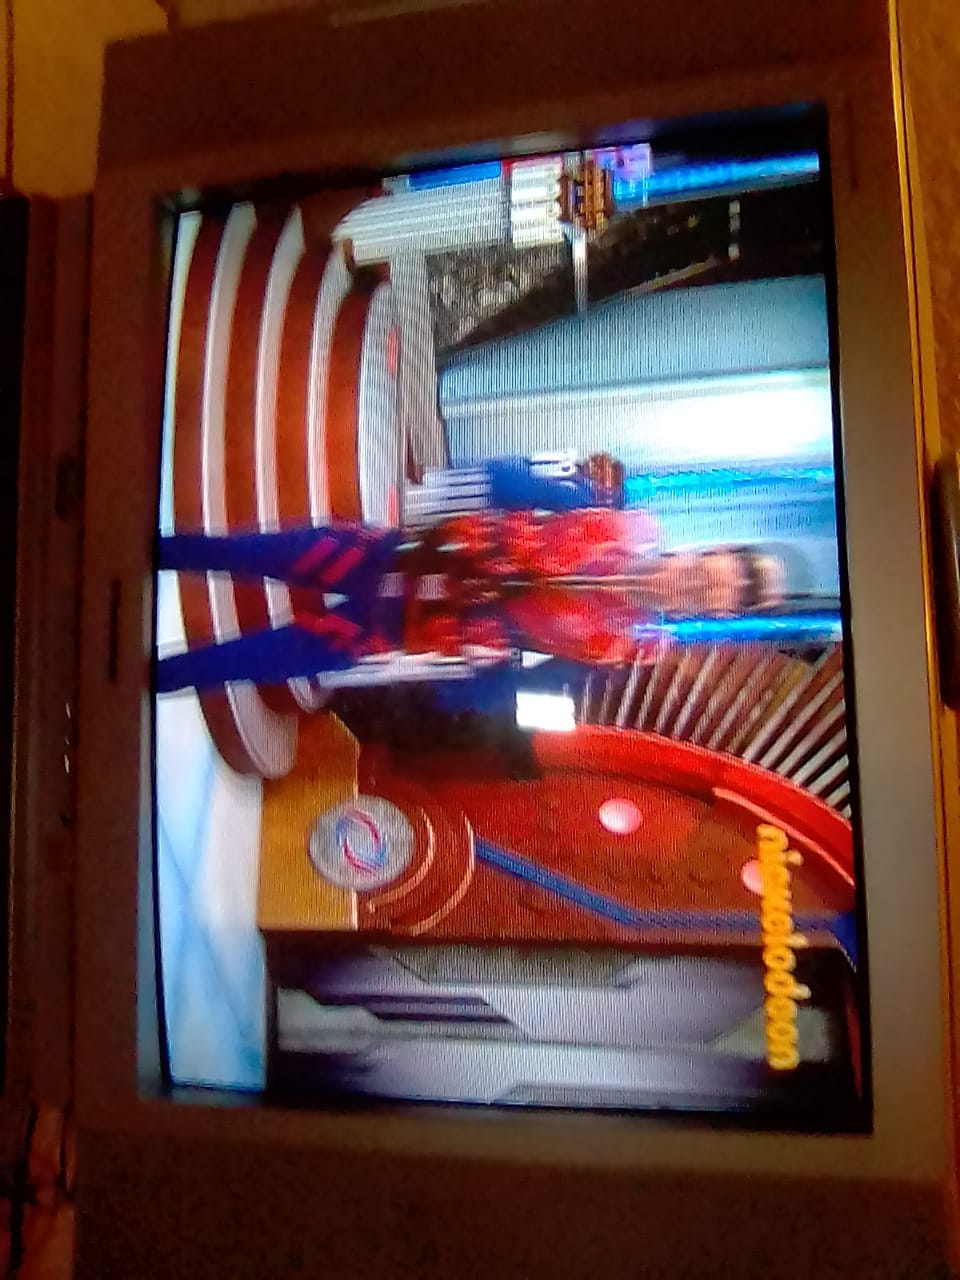 84 cm big scrren Wharfedale tv perfect